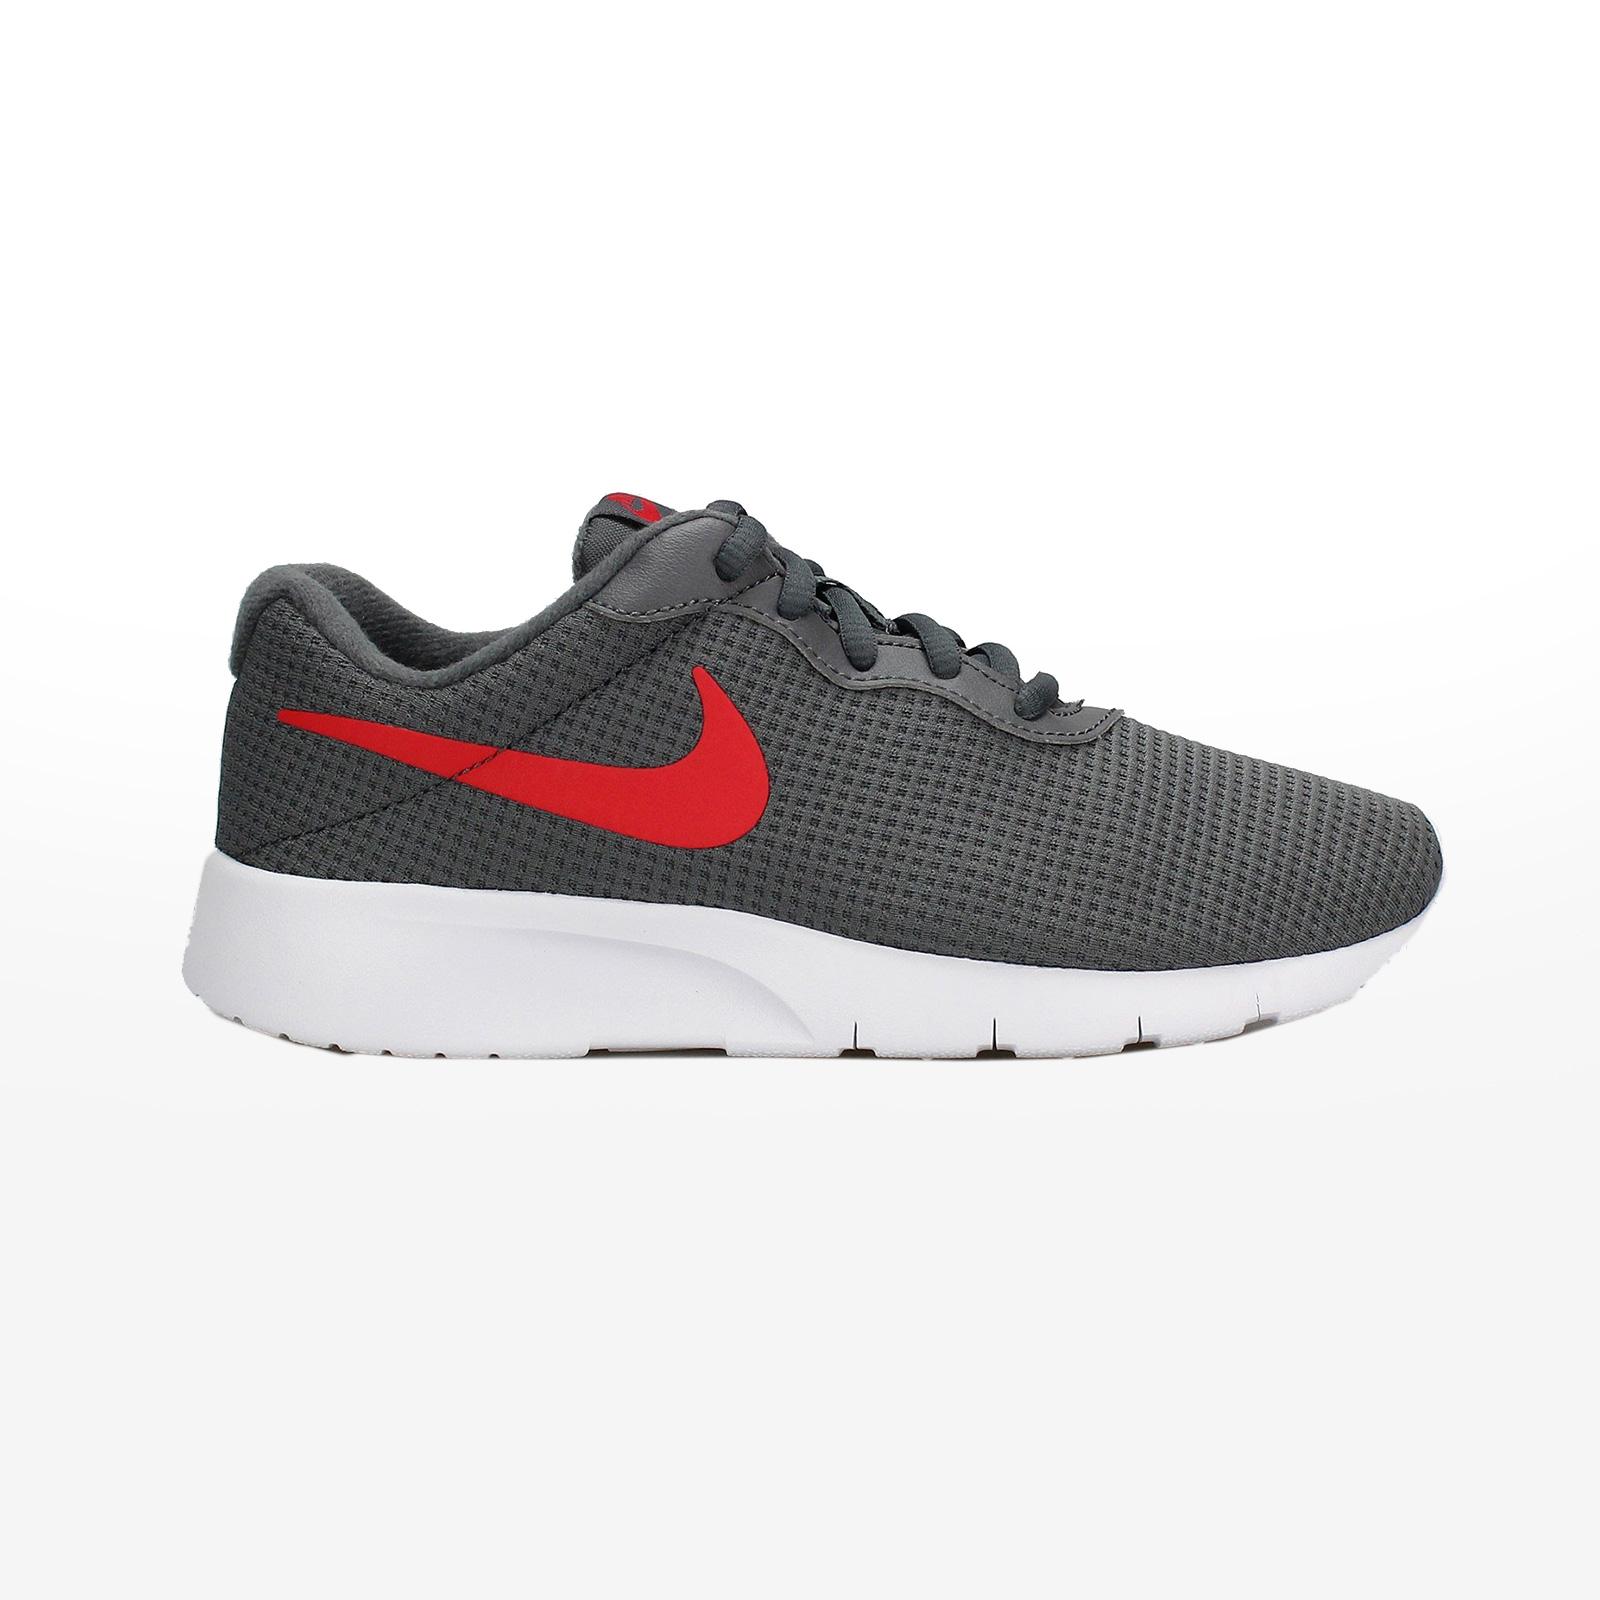 50010a041c0 Sportcafe Nike – NIKE TANJUN (GS) – DARK GREY/UNIVERSITY RED-WHITE